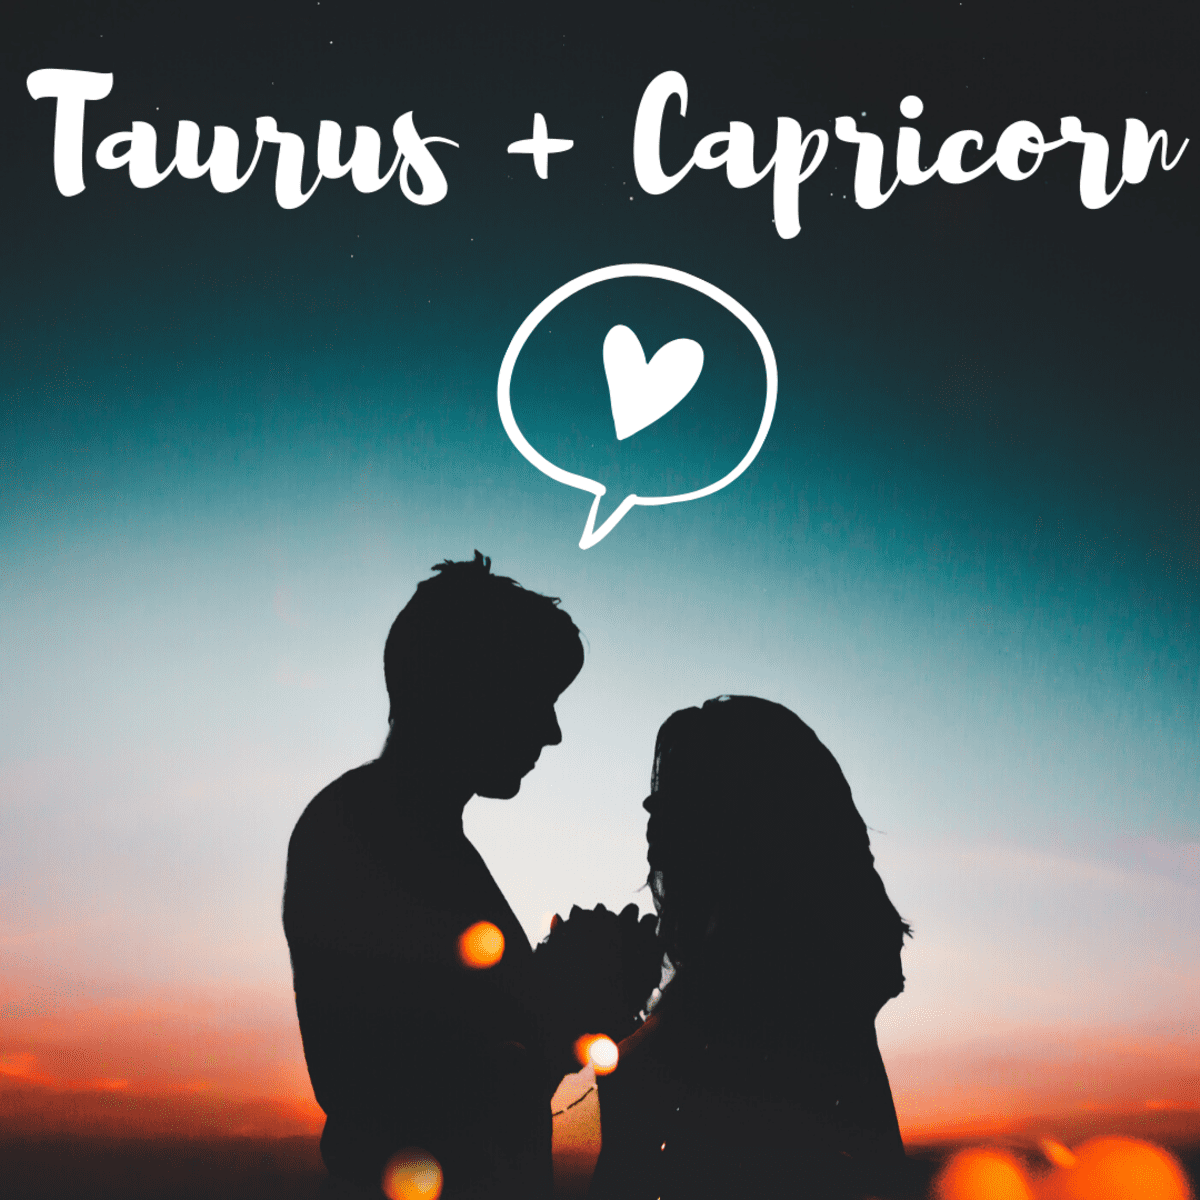 Compatibility taurus female capricorn male Taurus and